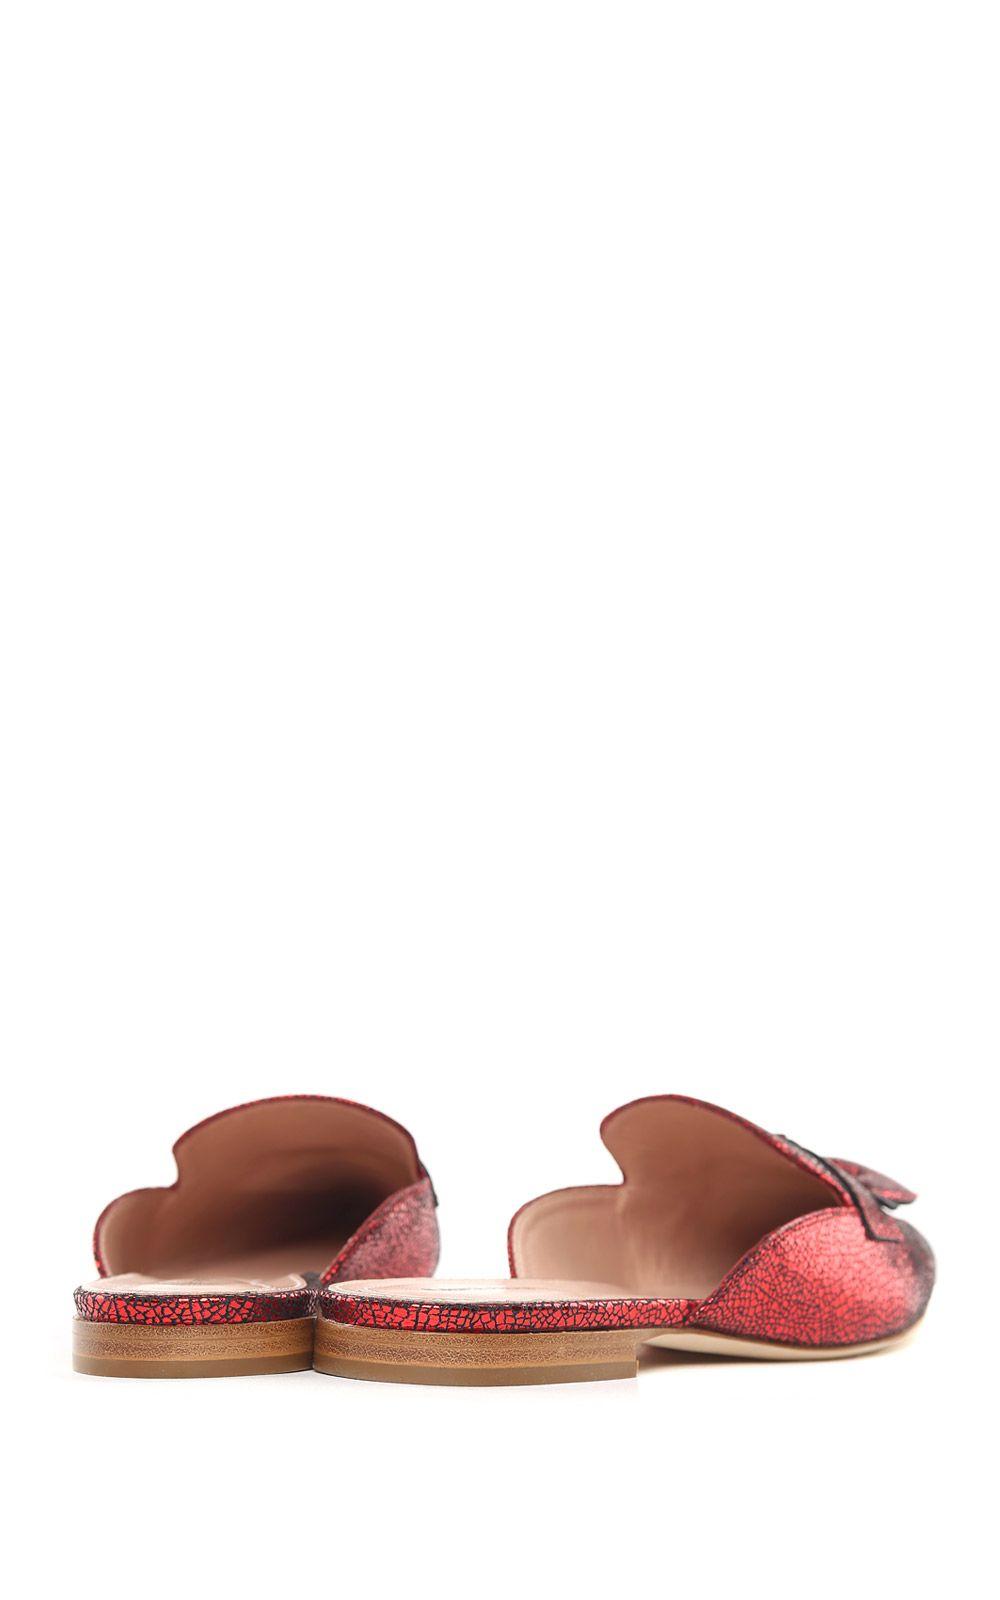 Mia metallic-leather backless loafers Alberta Ferretti Free Shipping Lowest Price VmOGKKbq